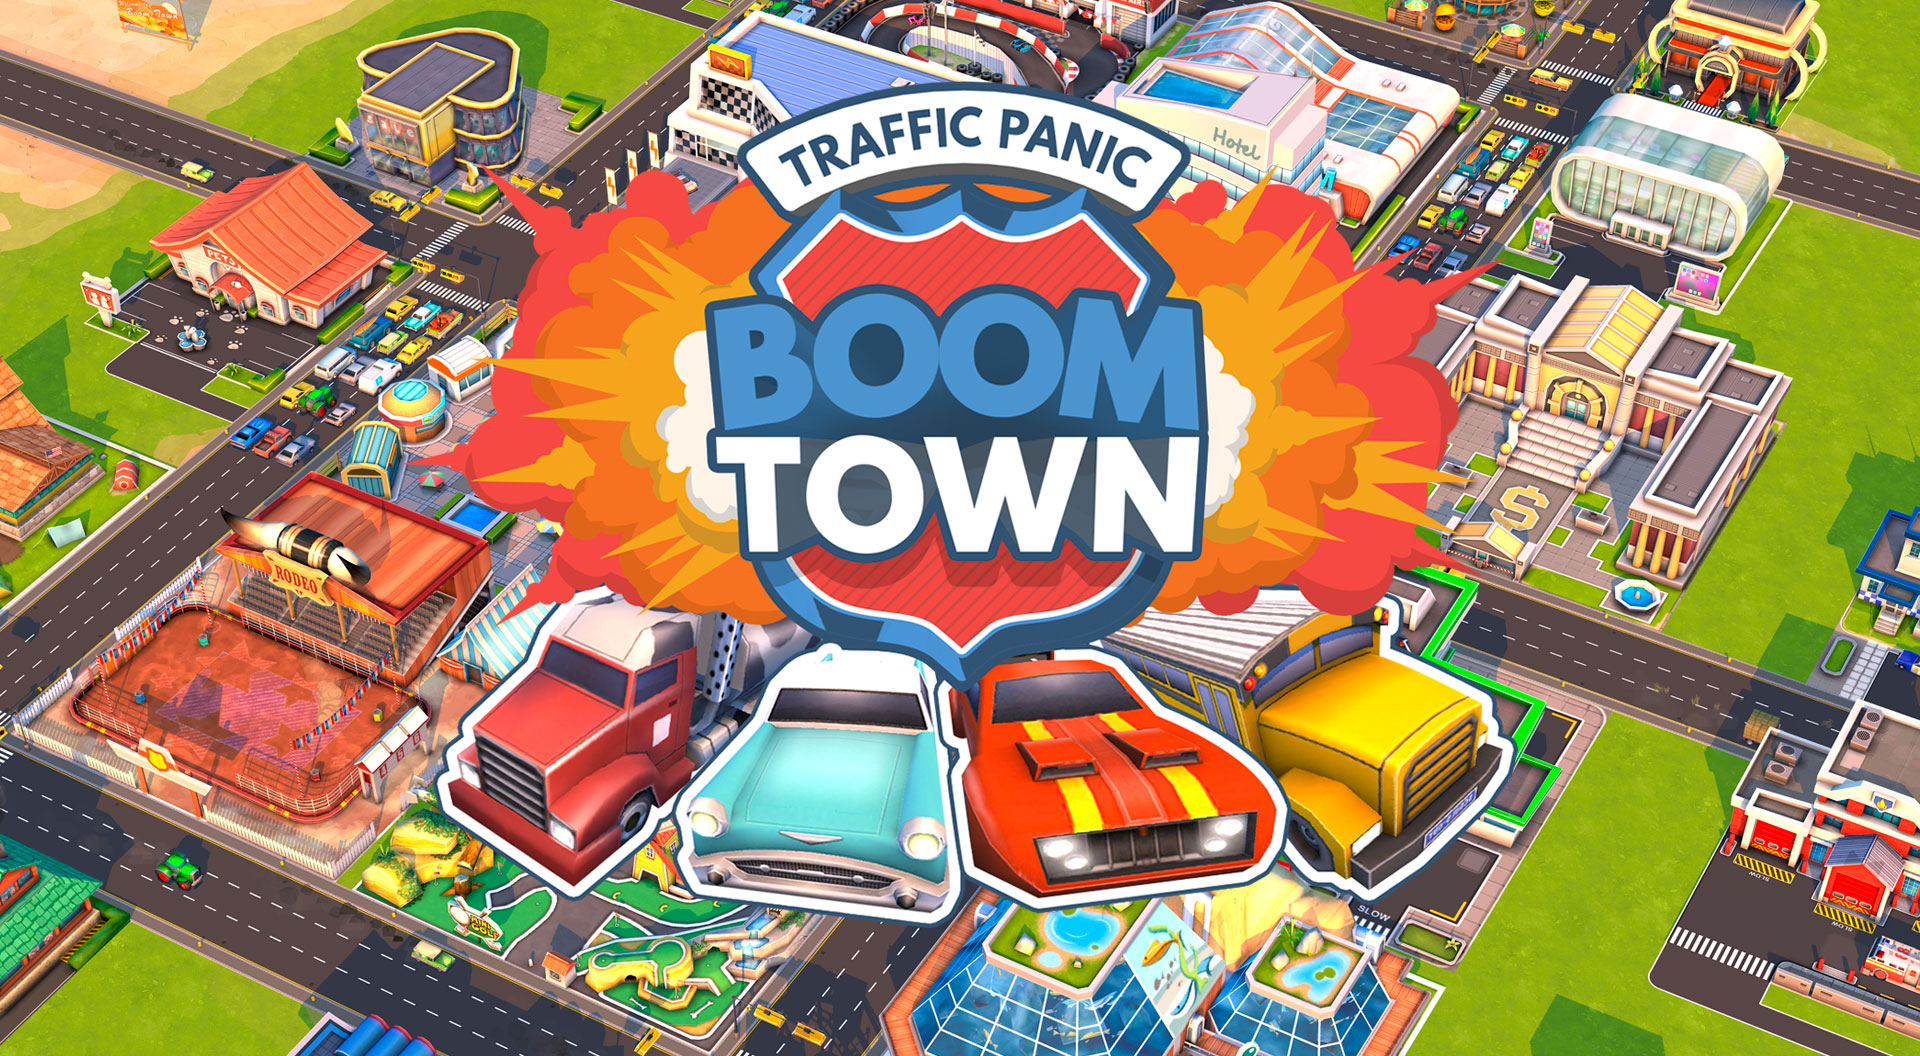 Trafic-panic-boom-town-mod-apk